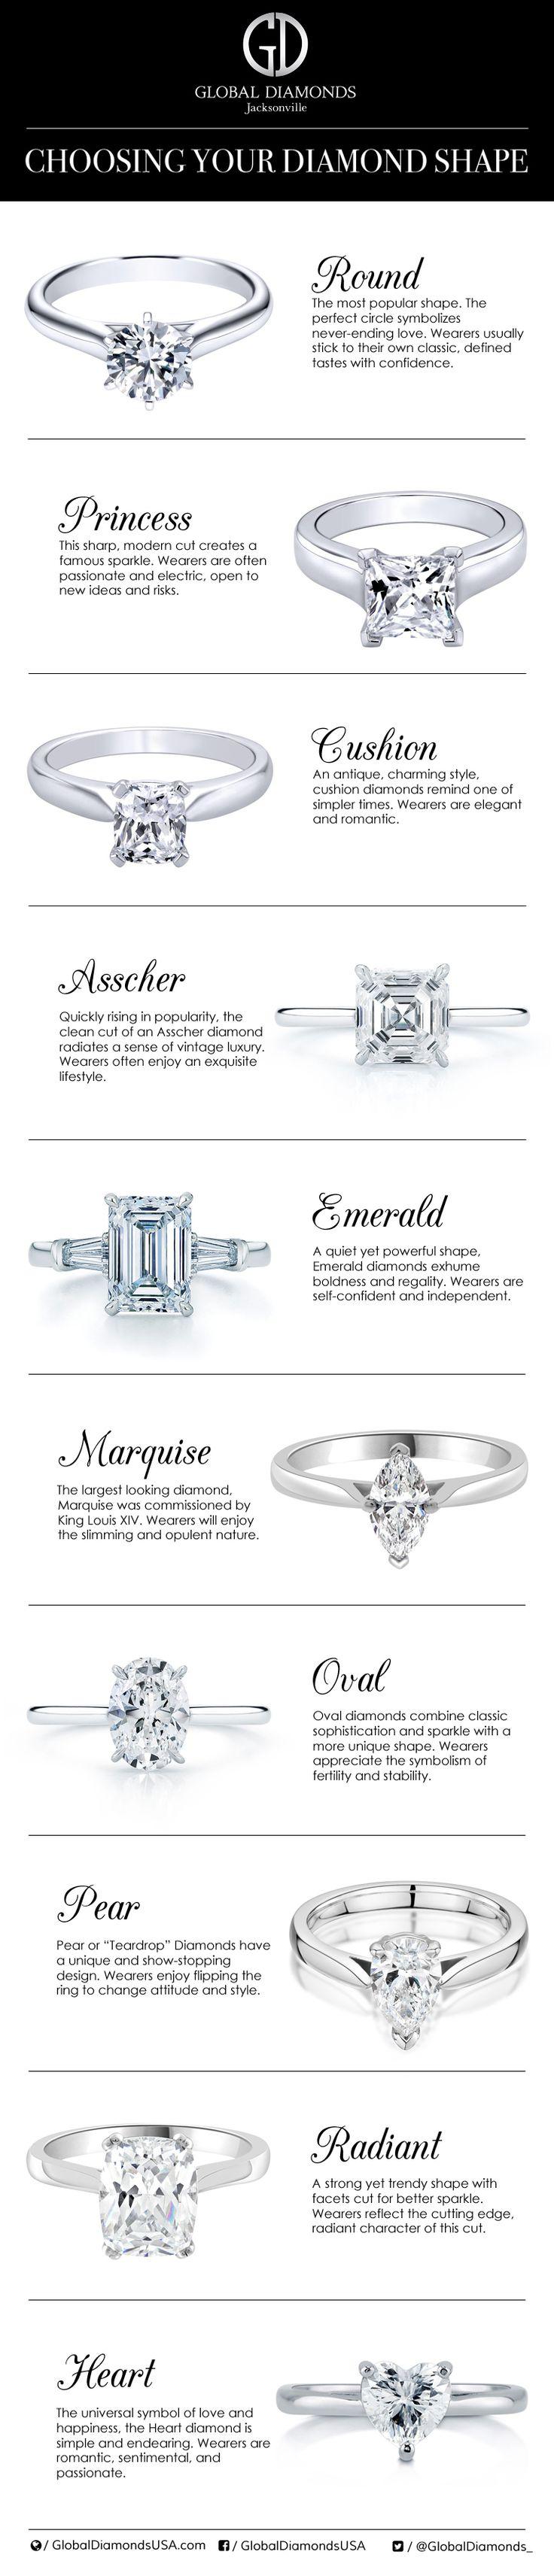 Choosing your diamond shape - http://globaldiamondsusa.com/engagement-rings-jacksonville/choosing-your-diamond-shape/ Discover the meaning of diamond shapes.